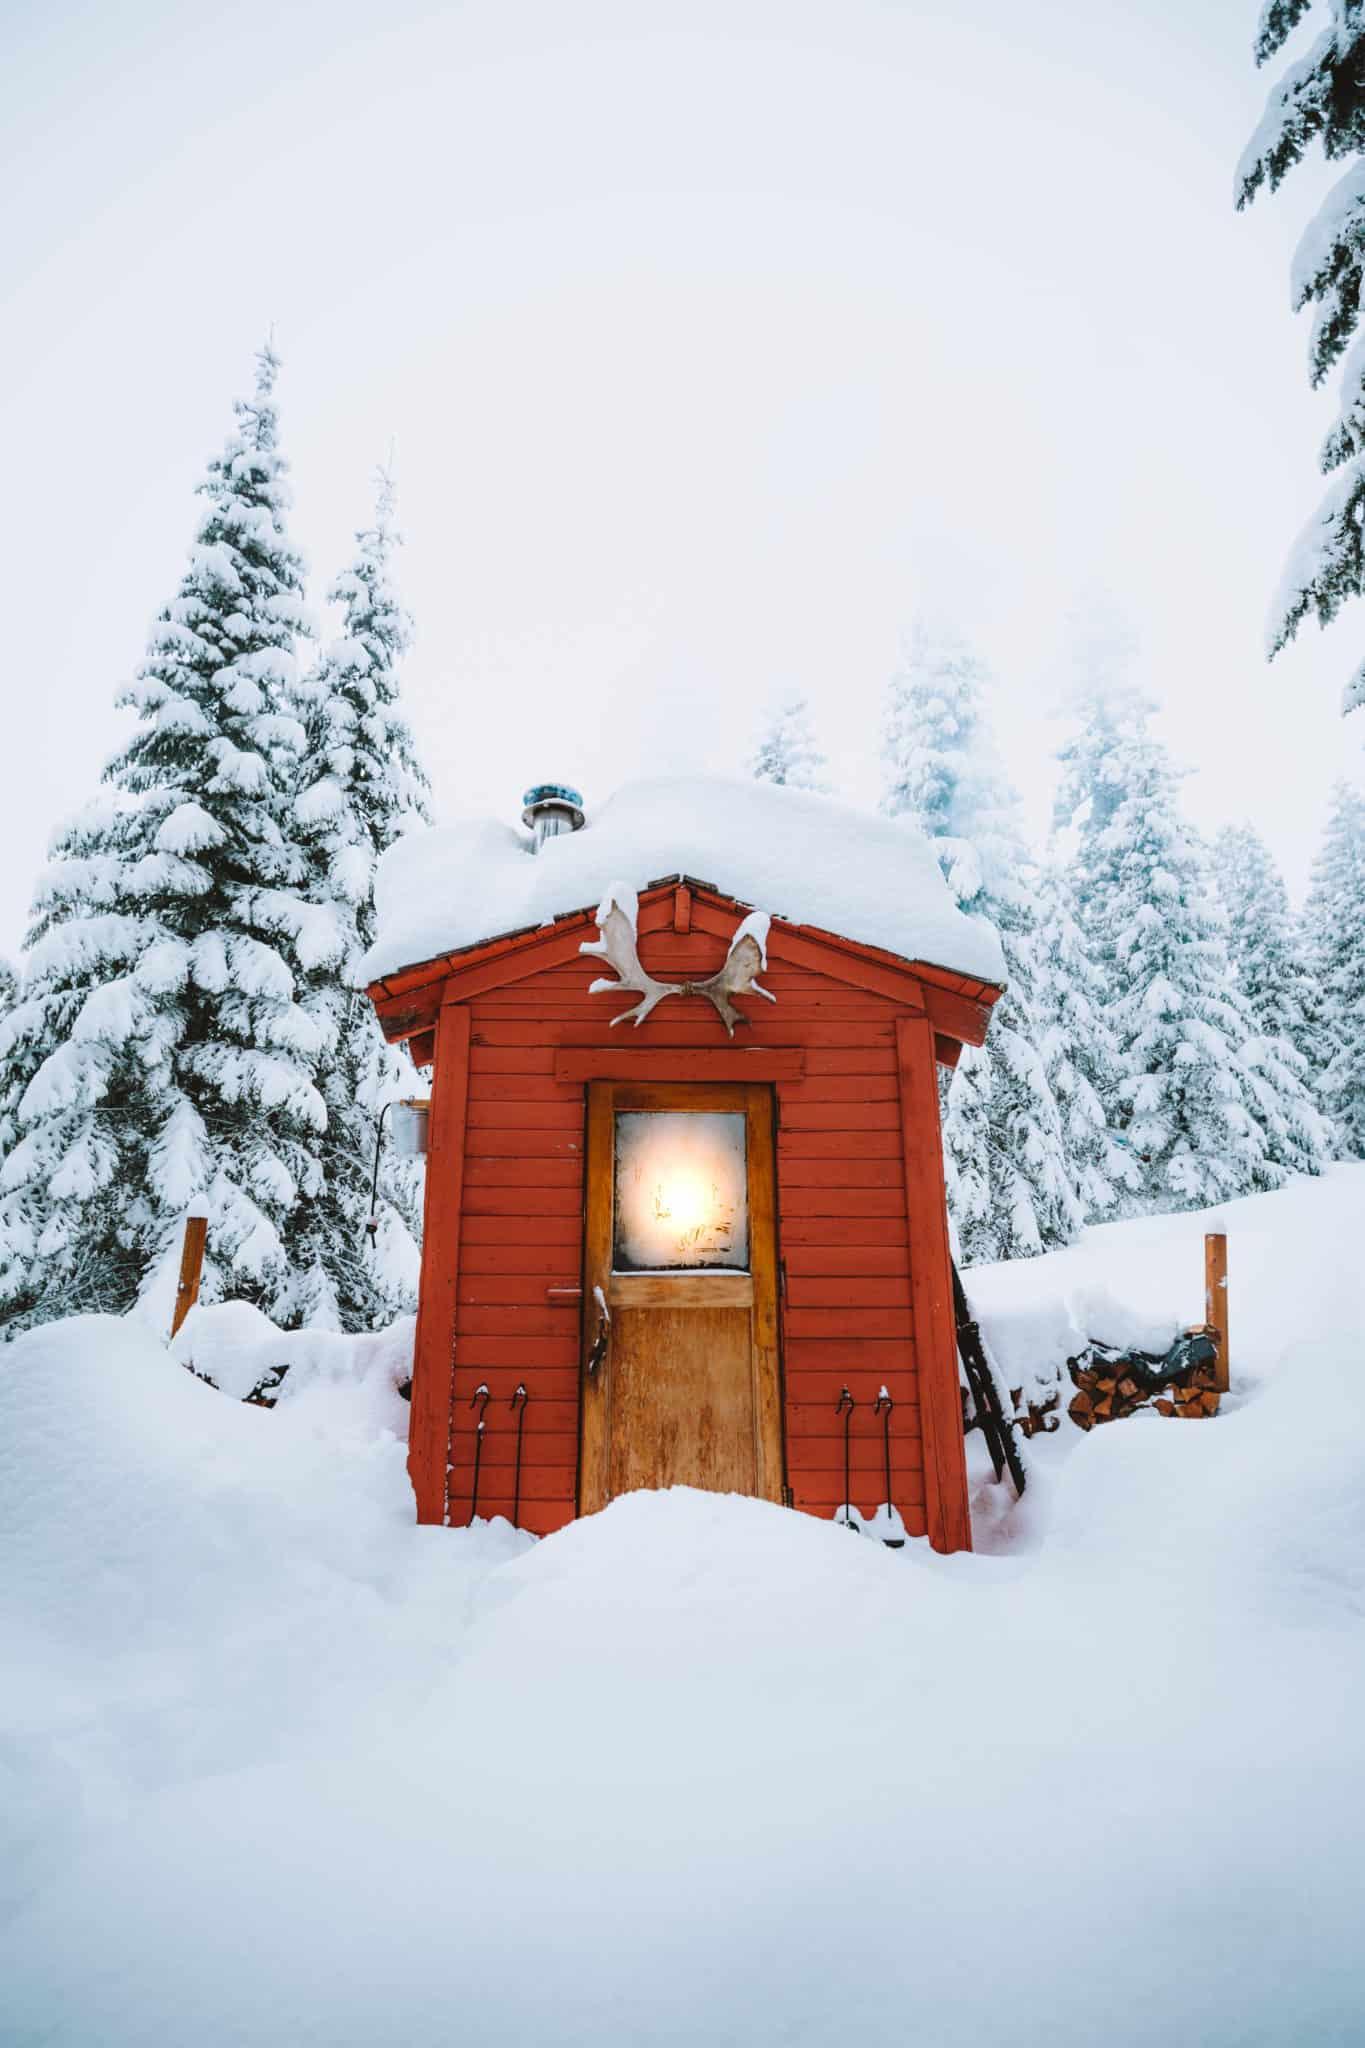 Sauna at Crystal Peak Lookout Idaho